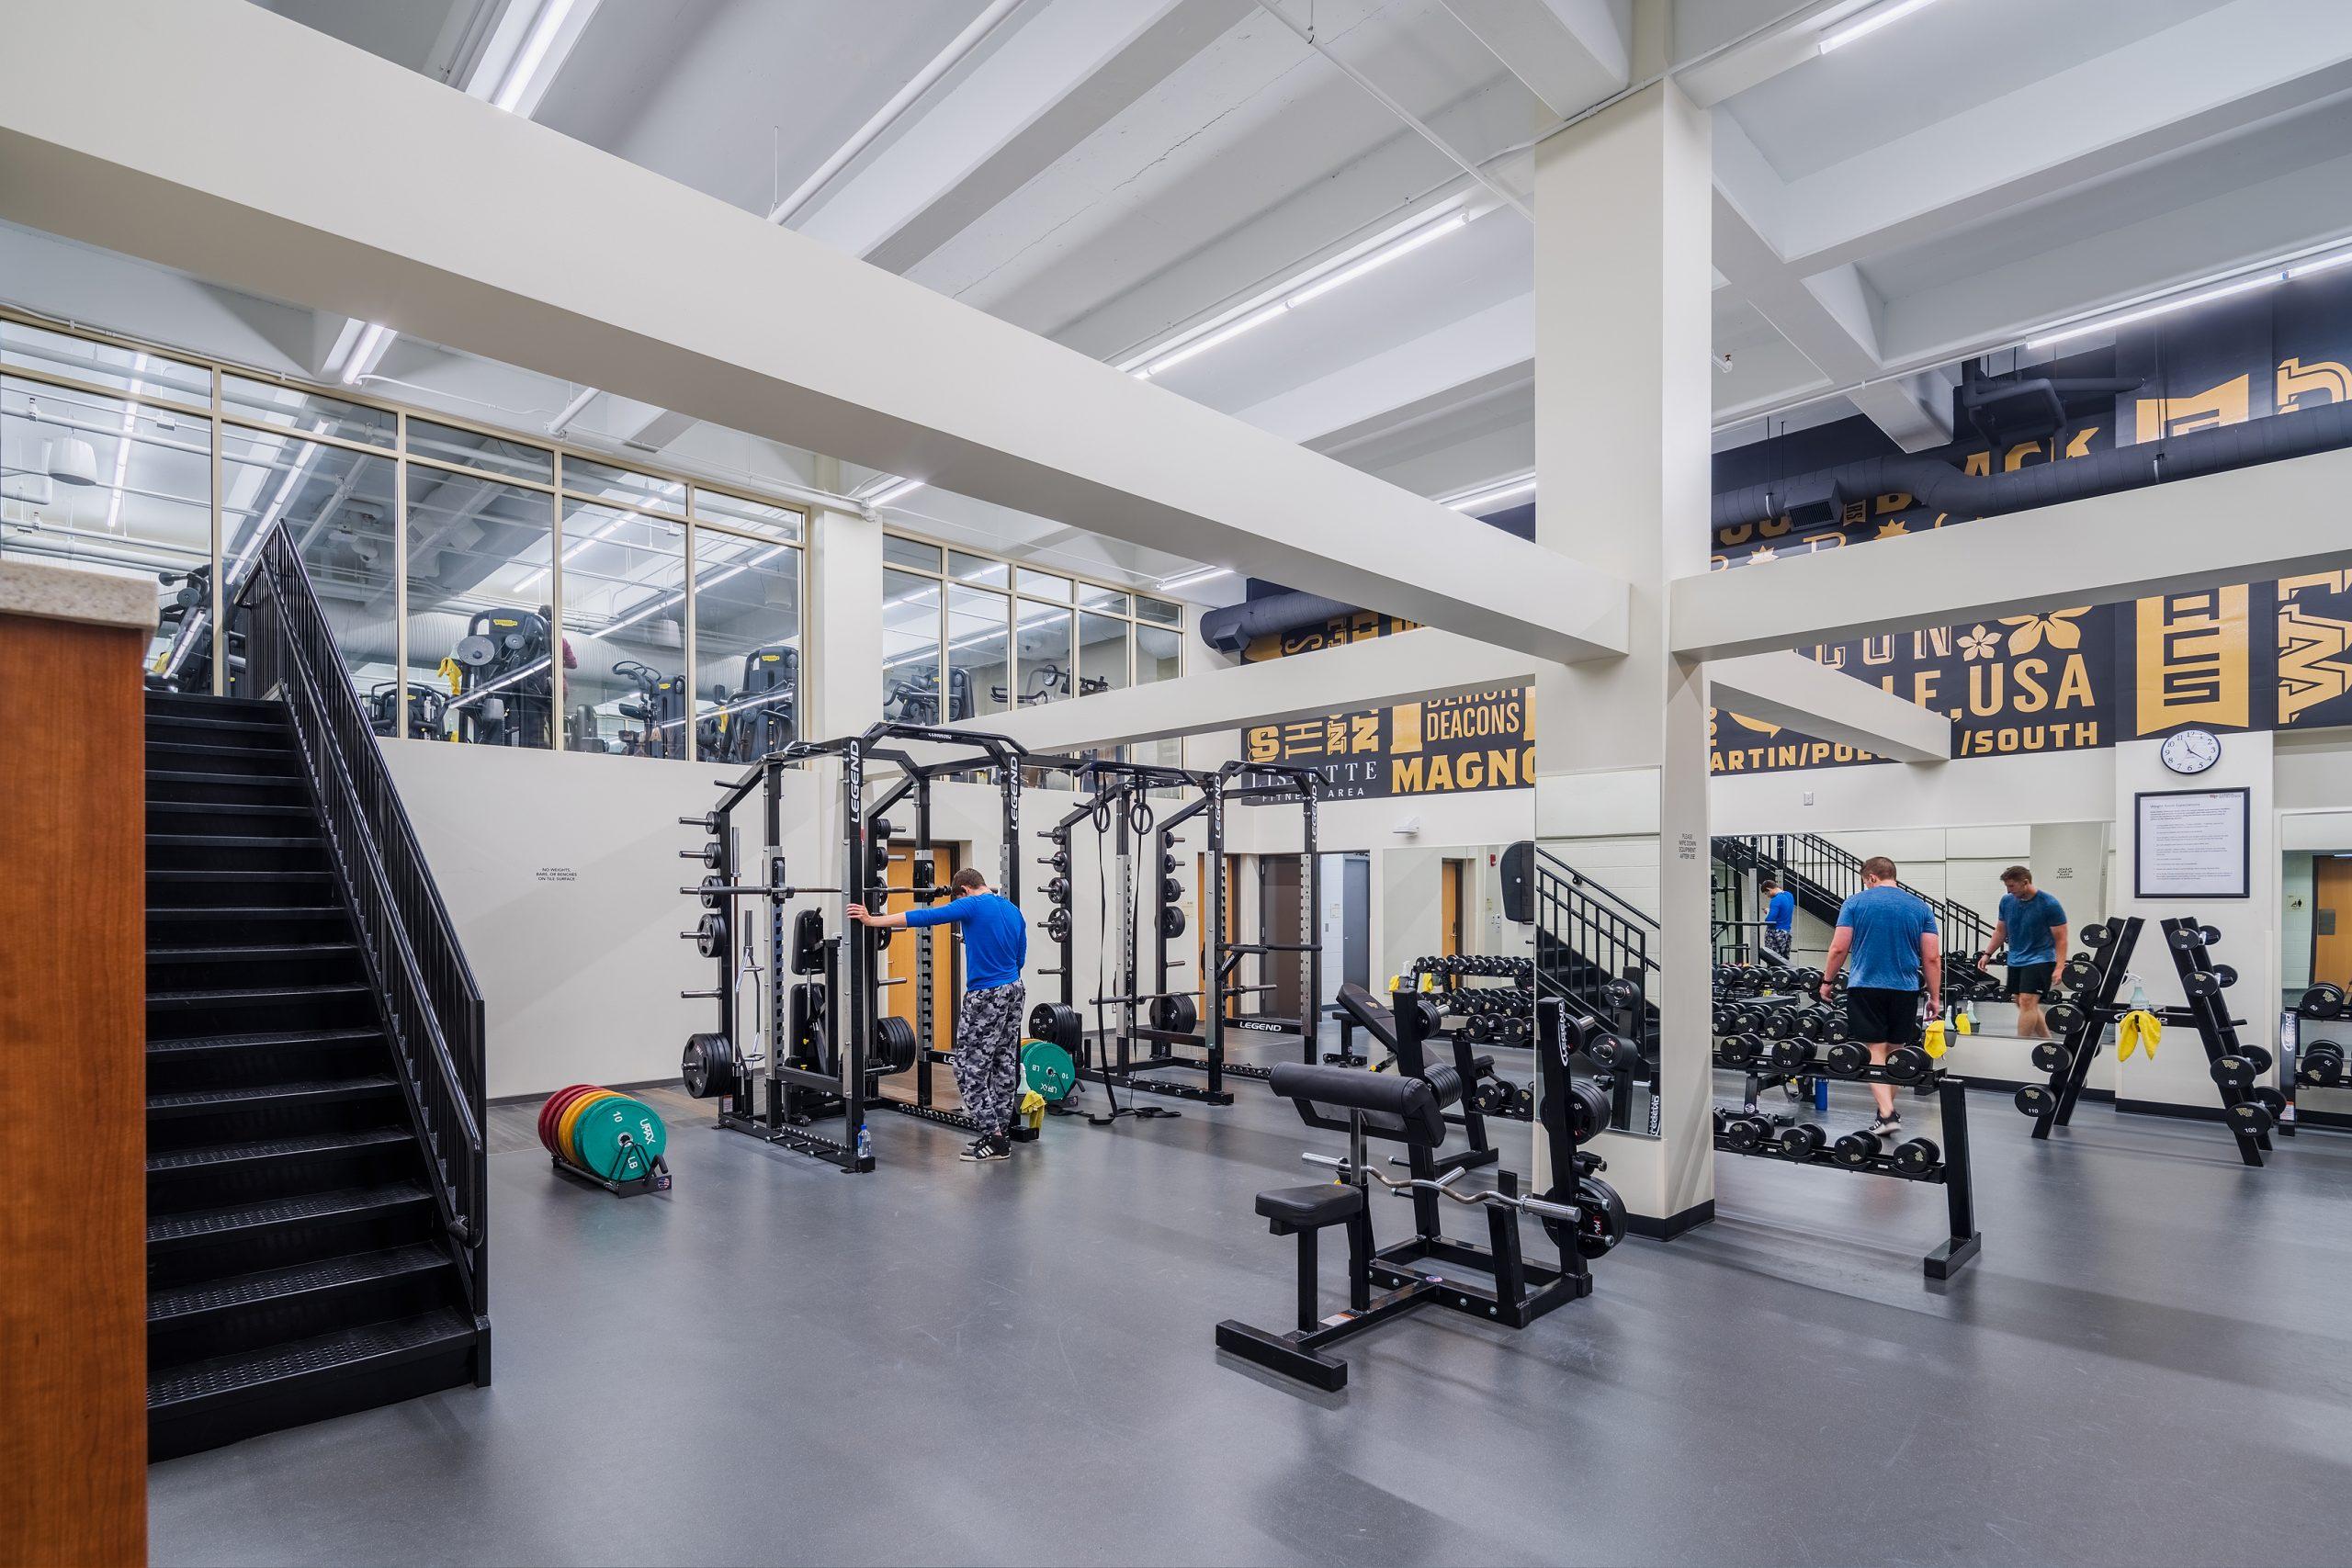 Fitness Equipment Discounts